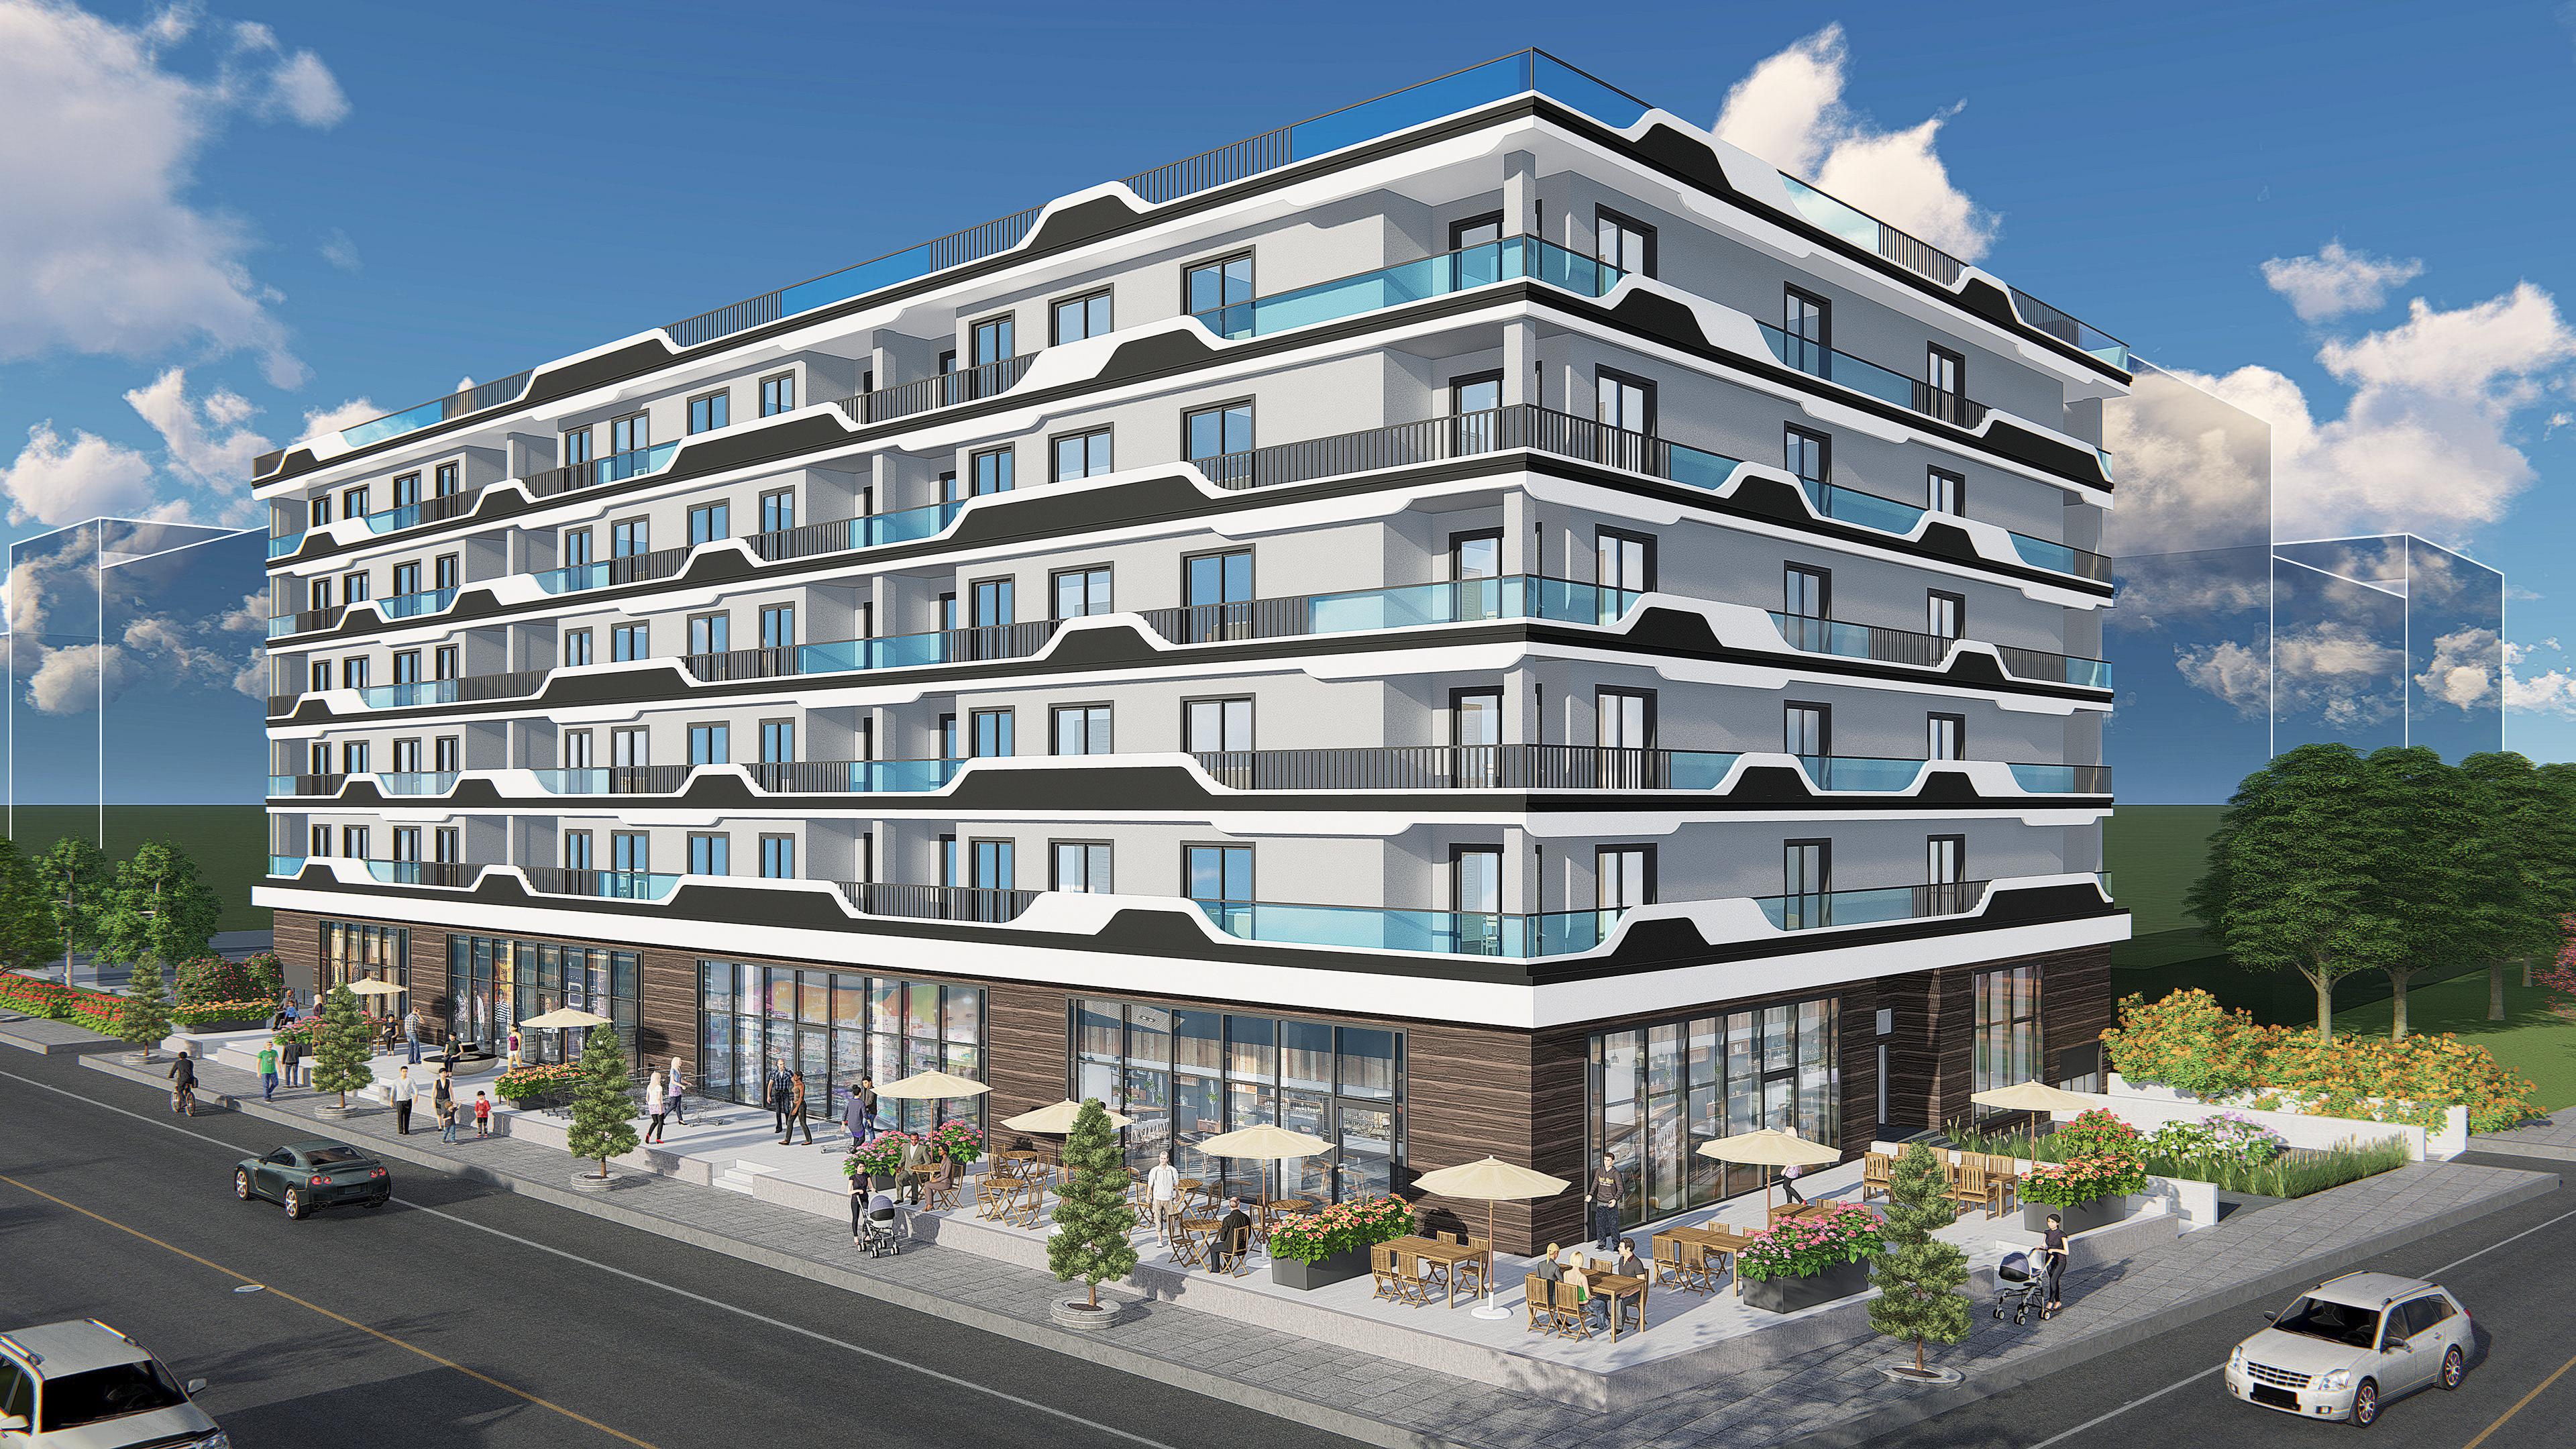 Ezgi Üstüner's Architectural Portfolio - Mixed Use Building